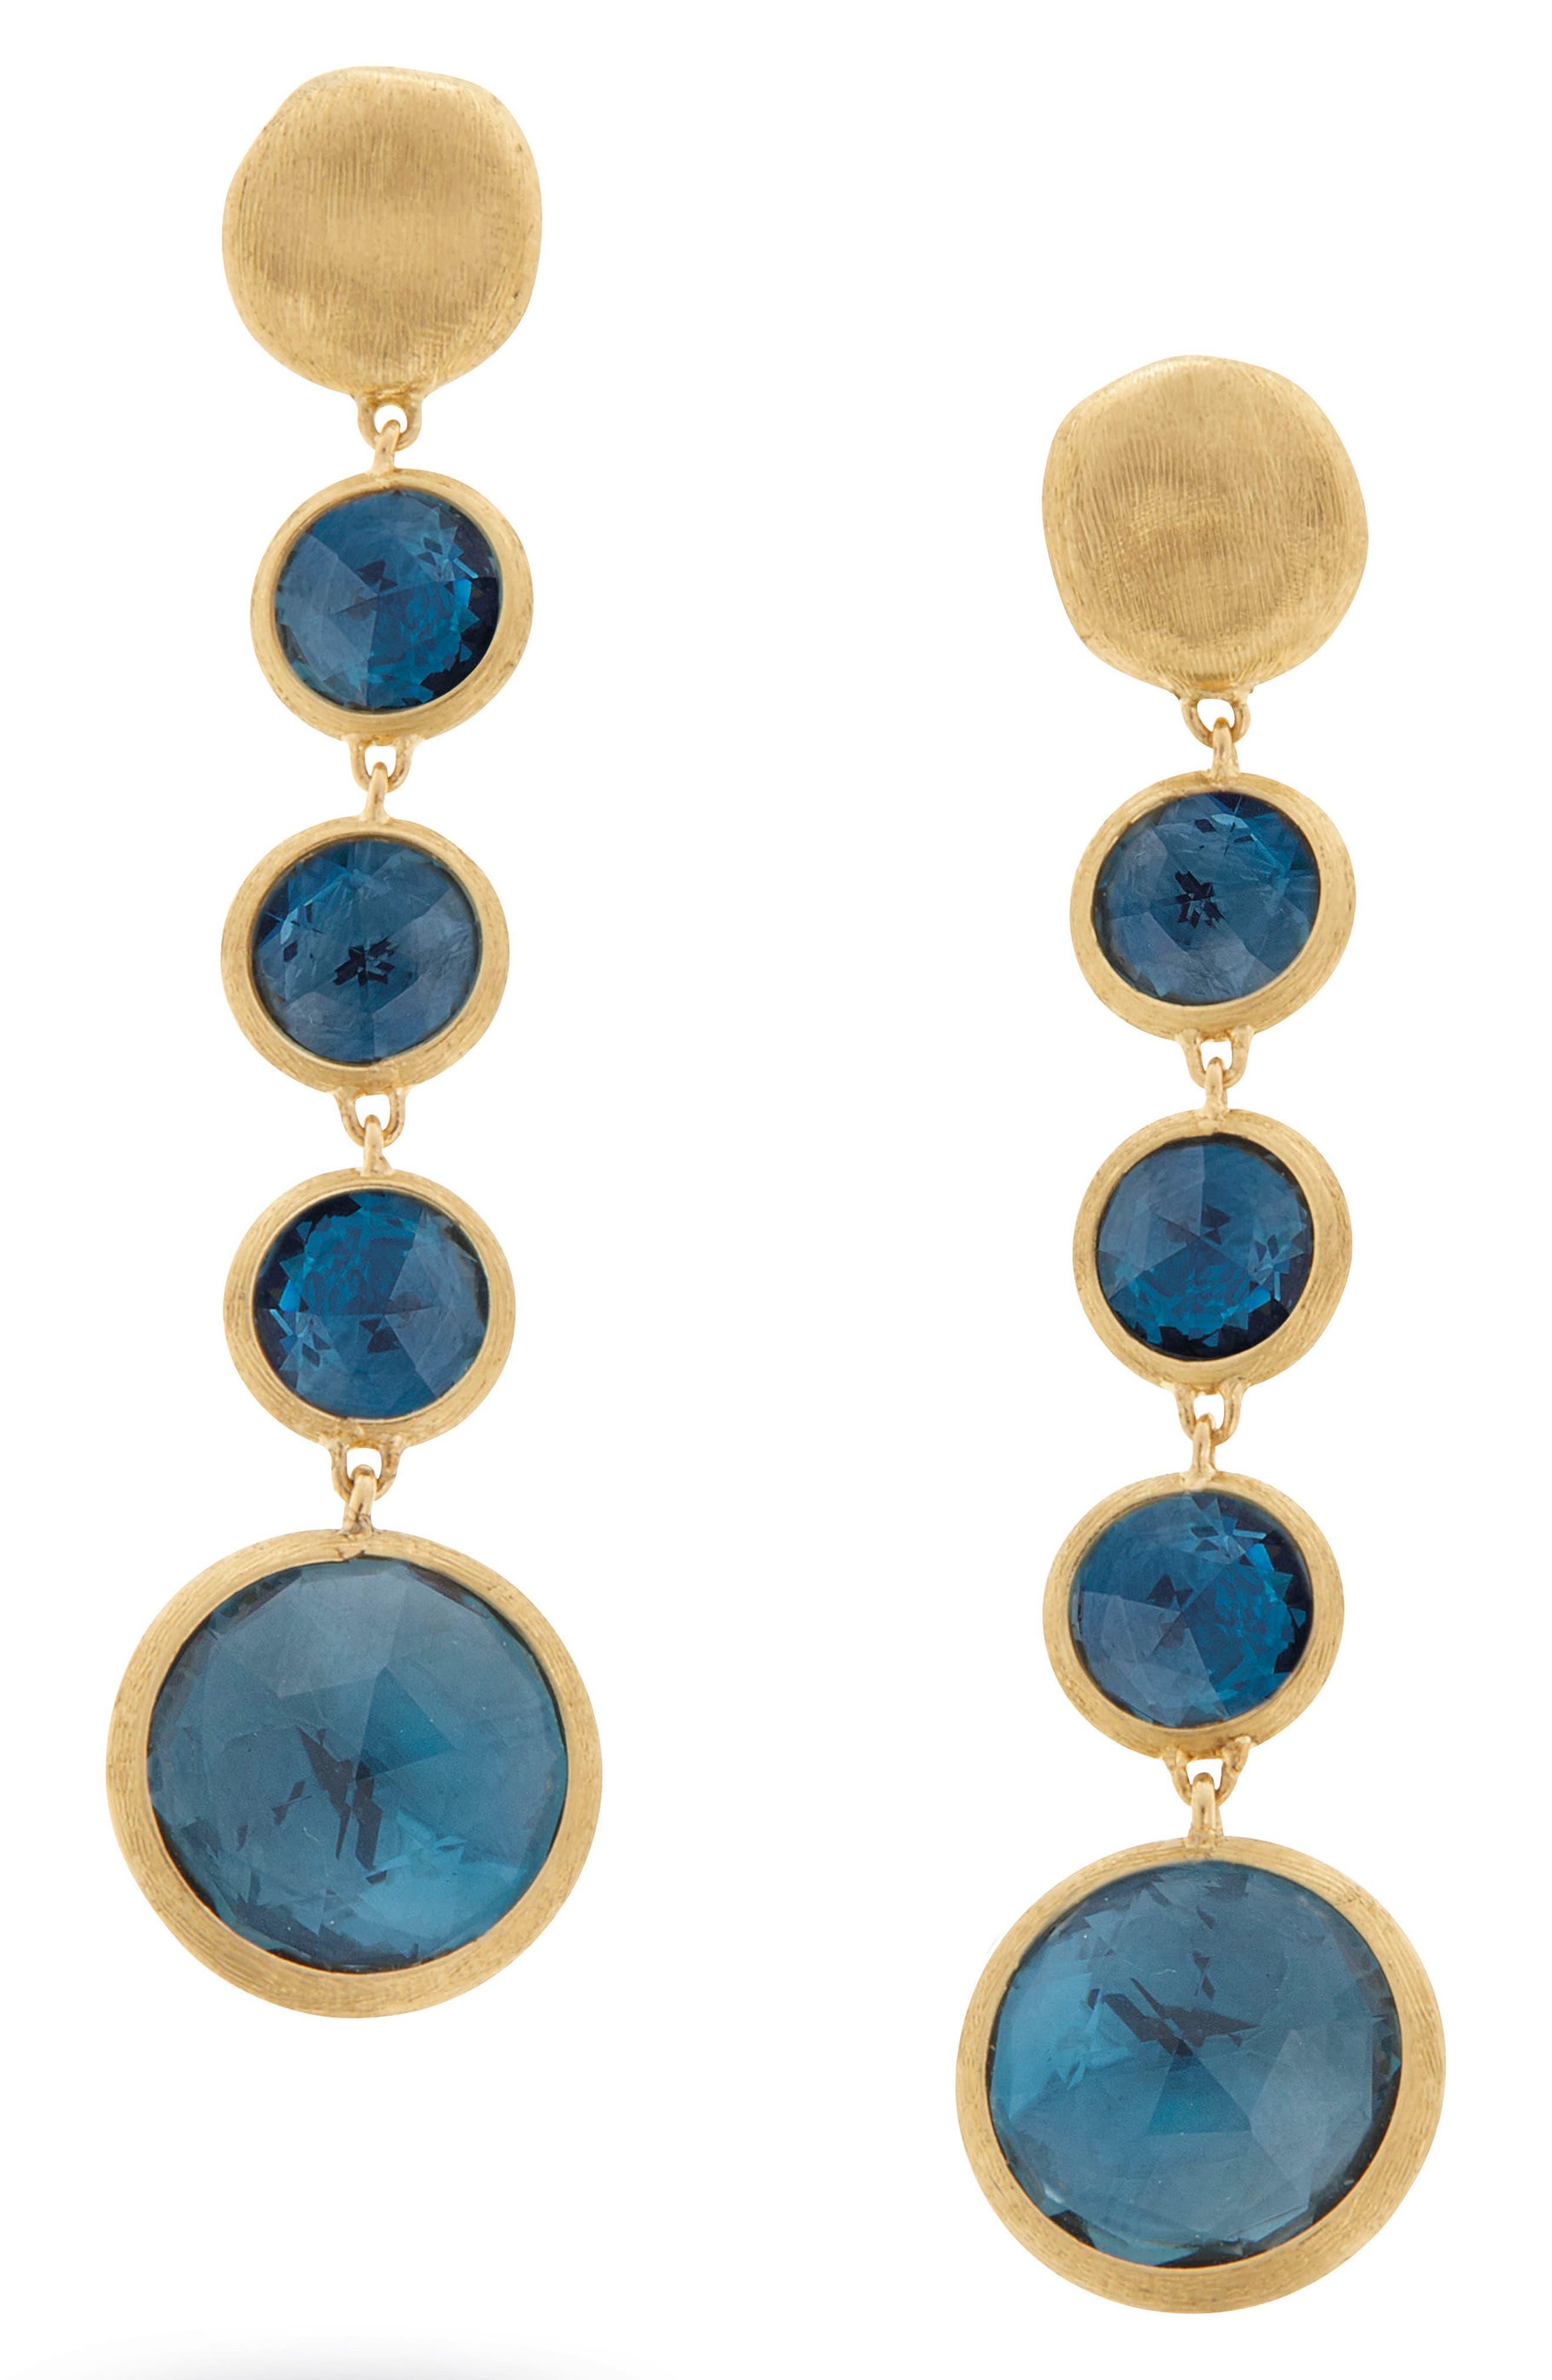 Main Image - Marco Bicego 'Jaipur' Semiprecious Stone Linear Earrings